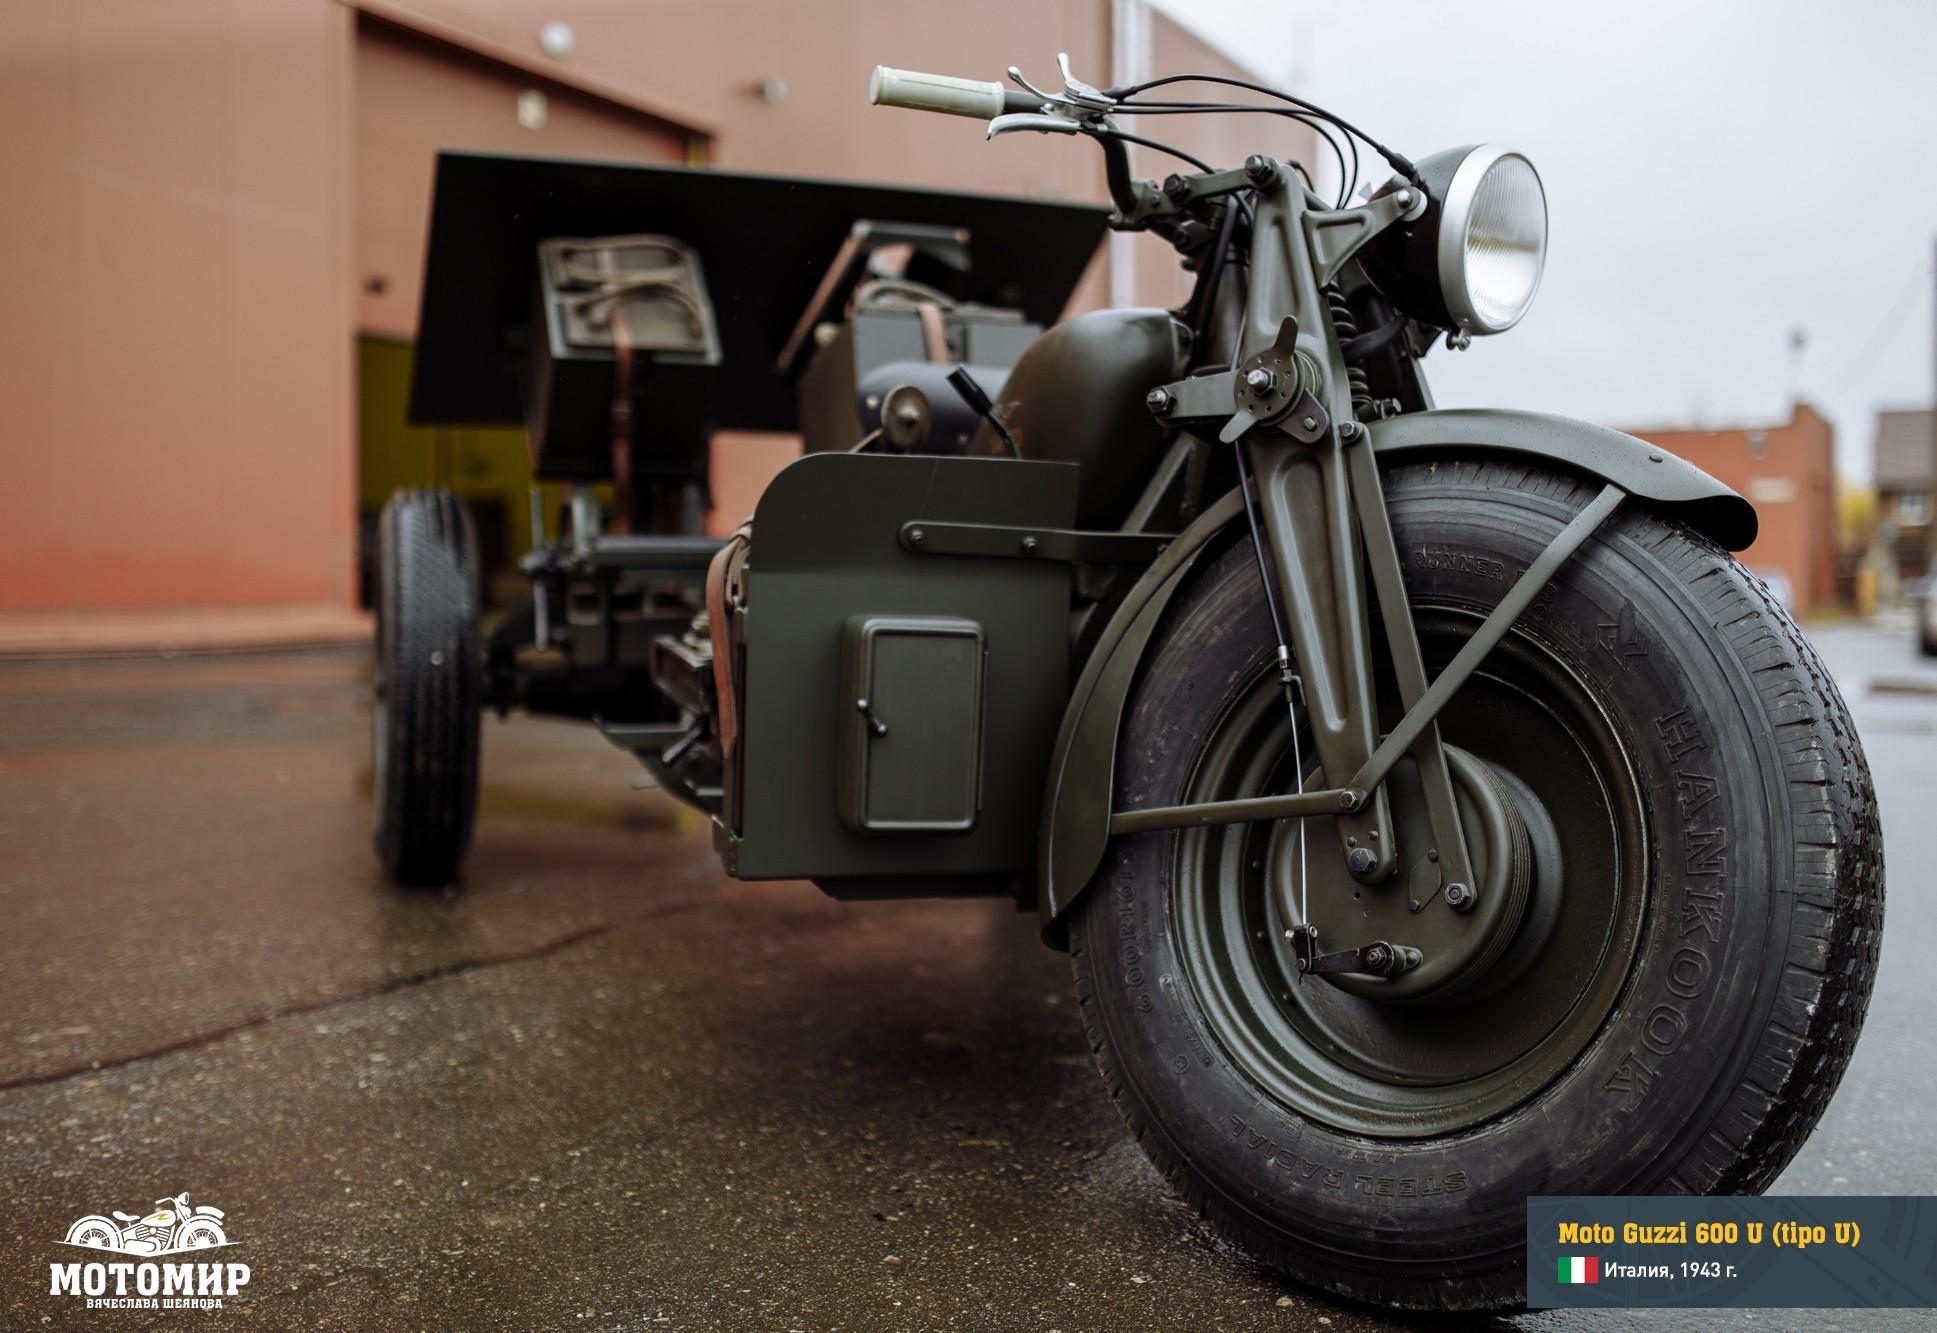 moto-guzzi-600-u-web-41